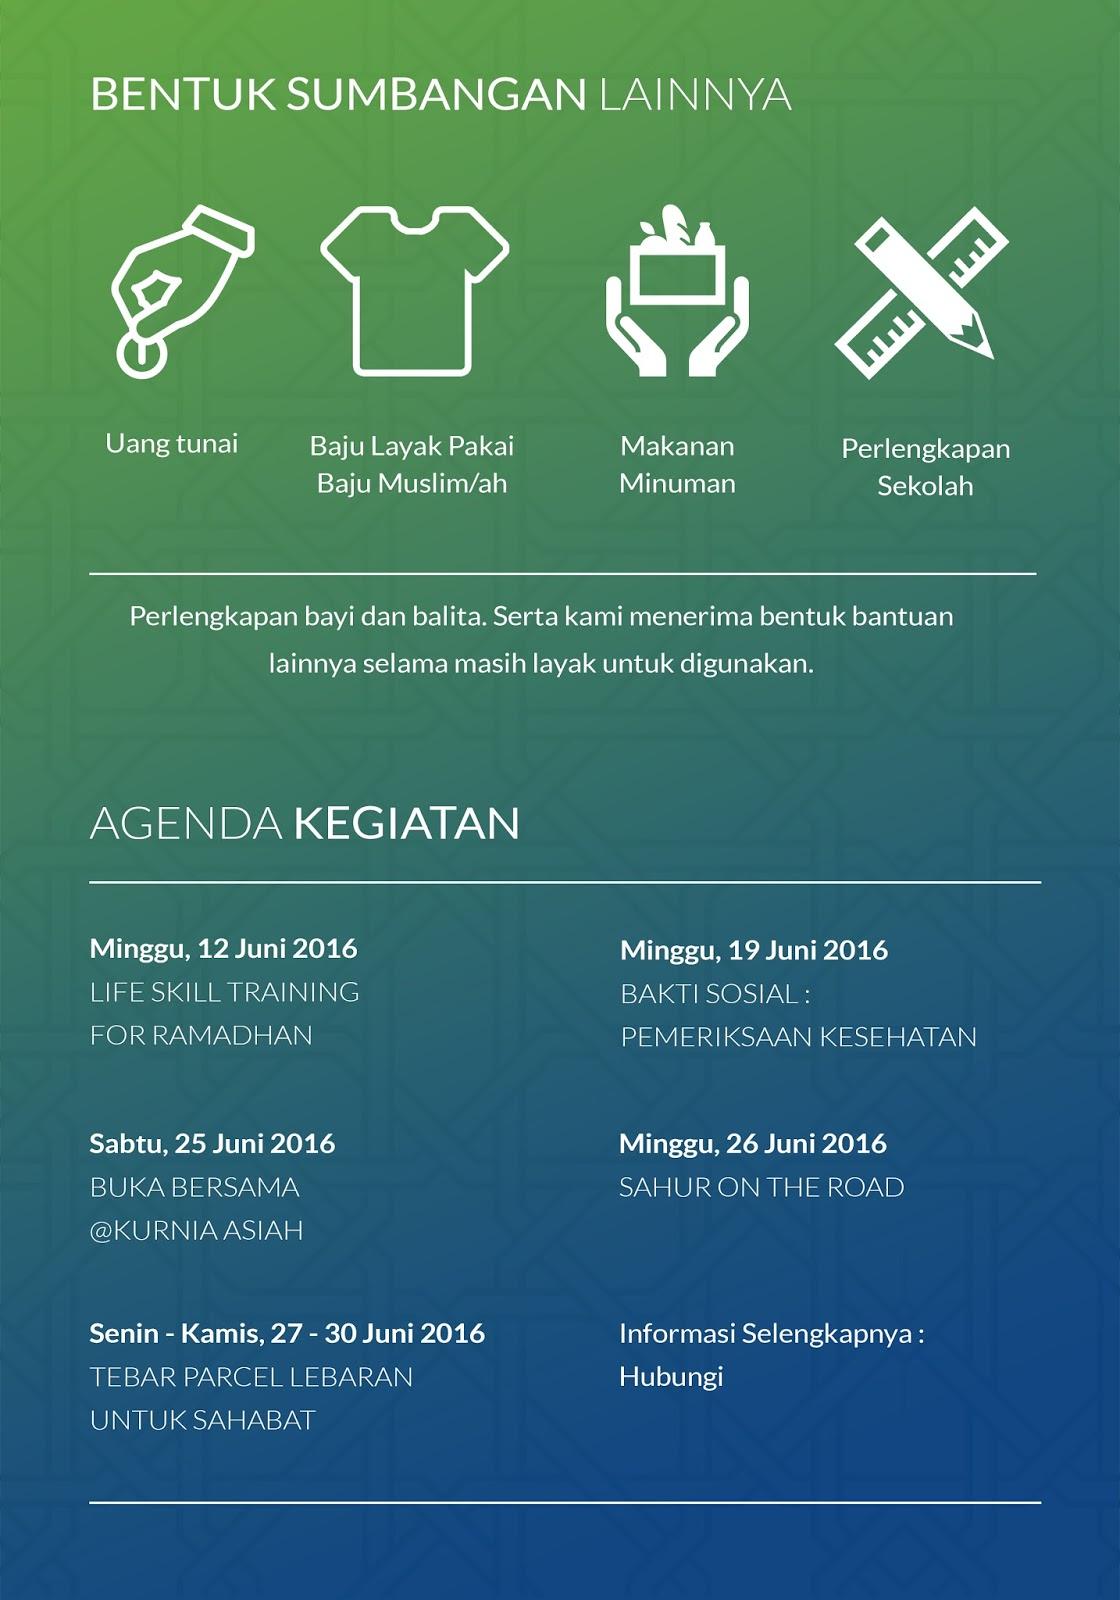 Saung It Berbagi Ramadhan 2016 Bersama Hopetimist Komunitas Tik